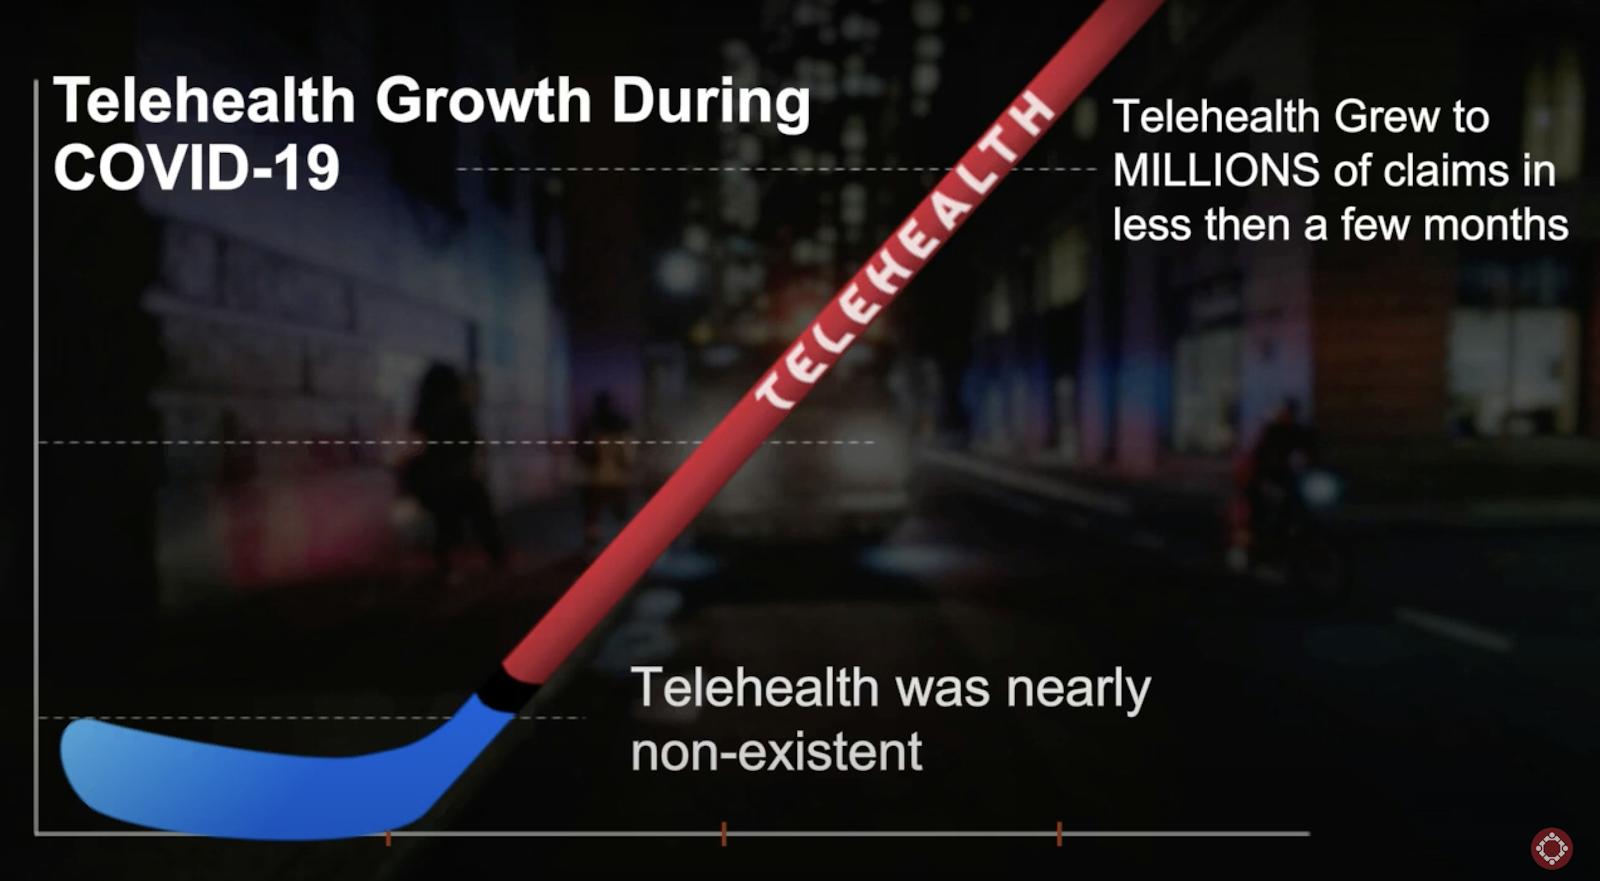 telehealth-growth-covid-19